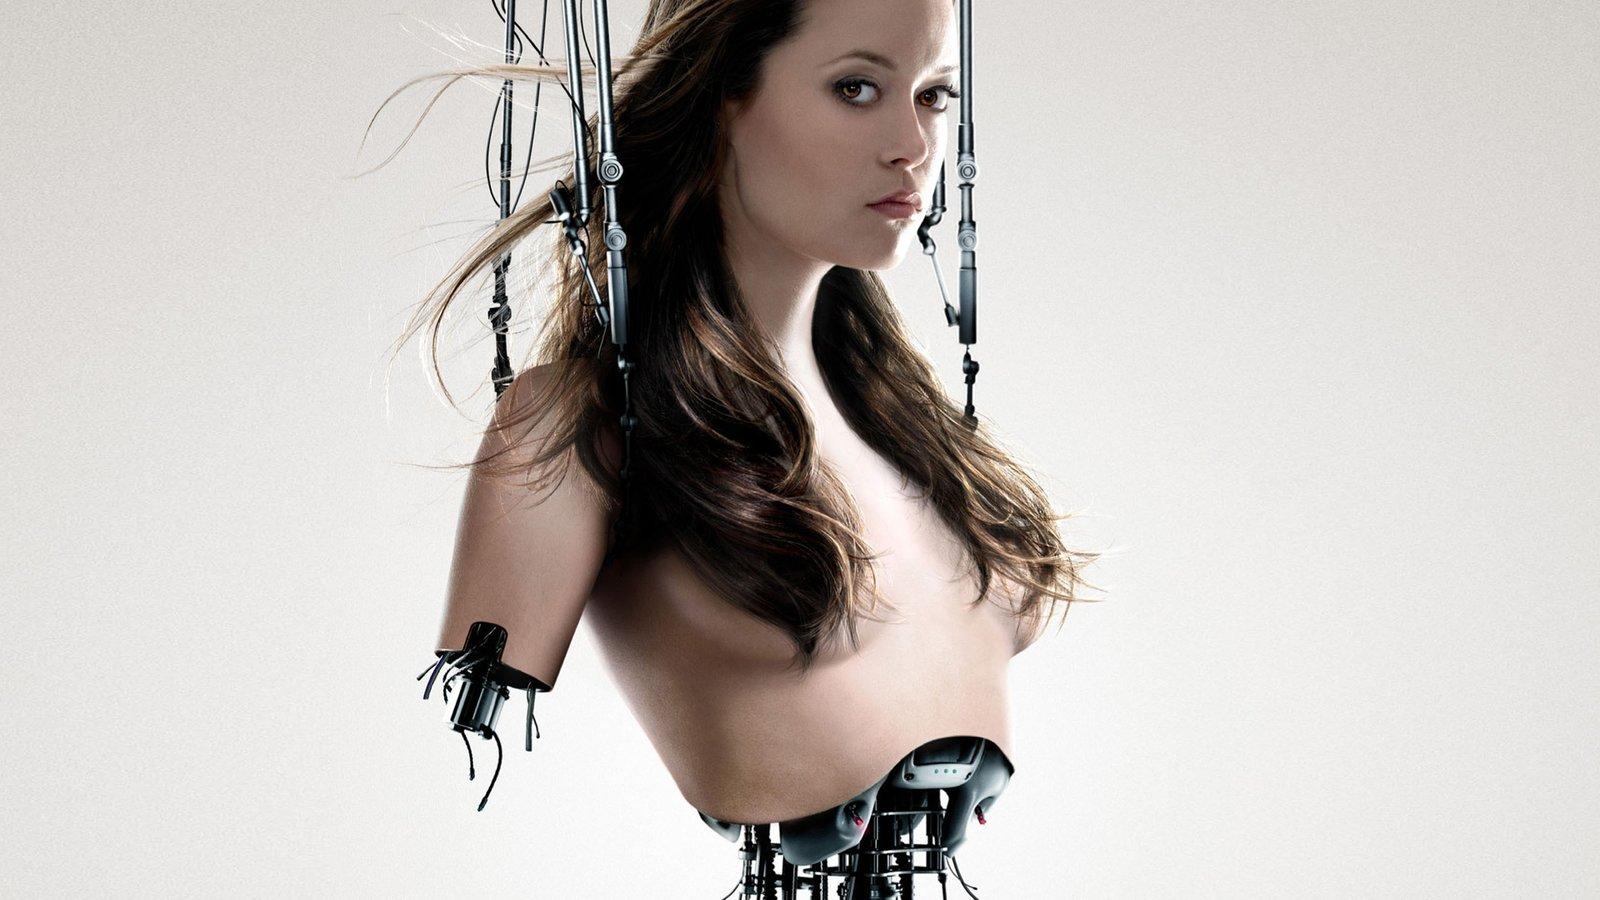 Терминатор: Хроники Сары Коннор / Terminator: The Sarah Connor Chronicles